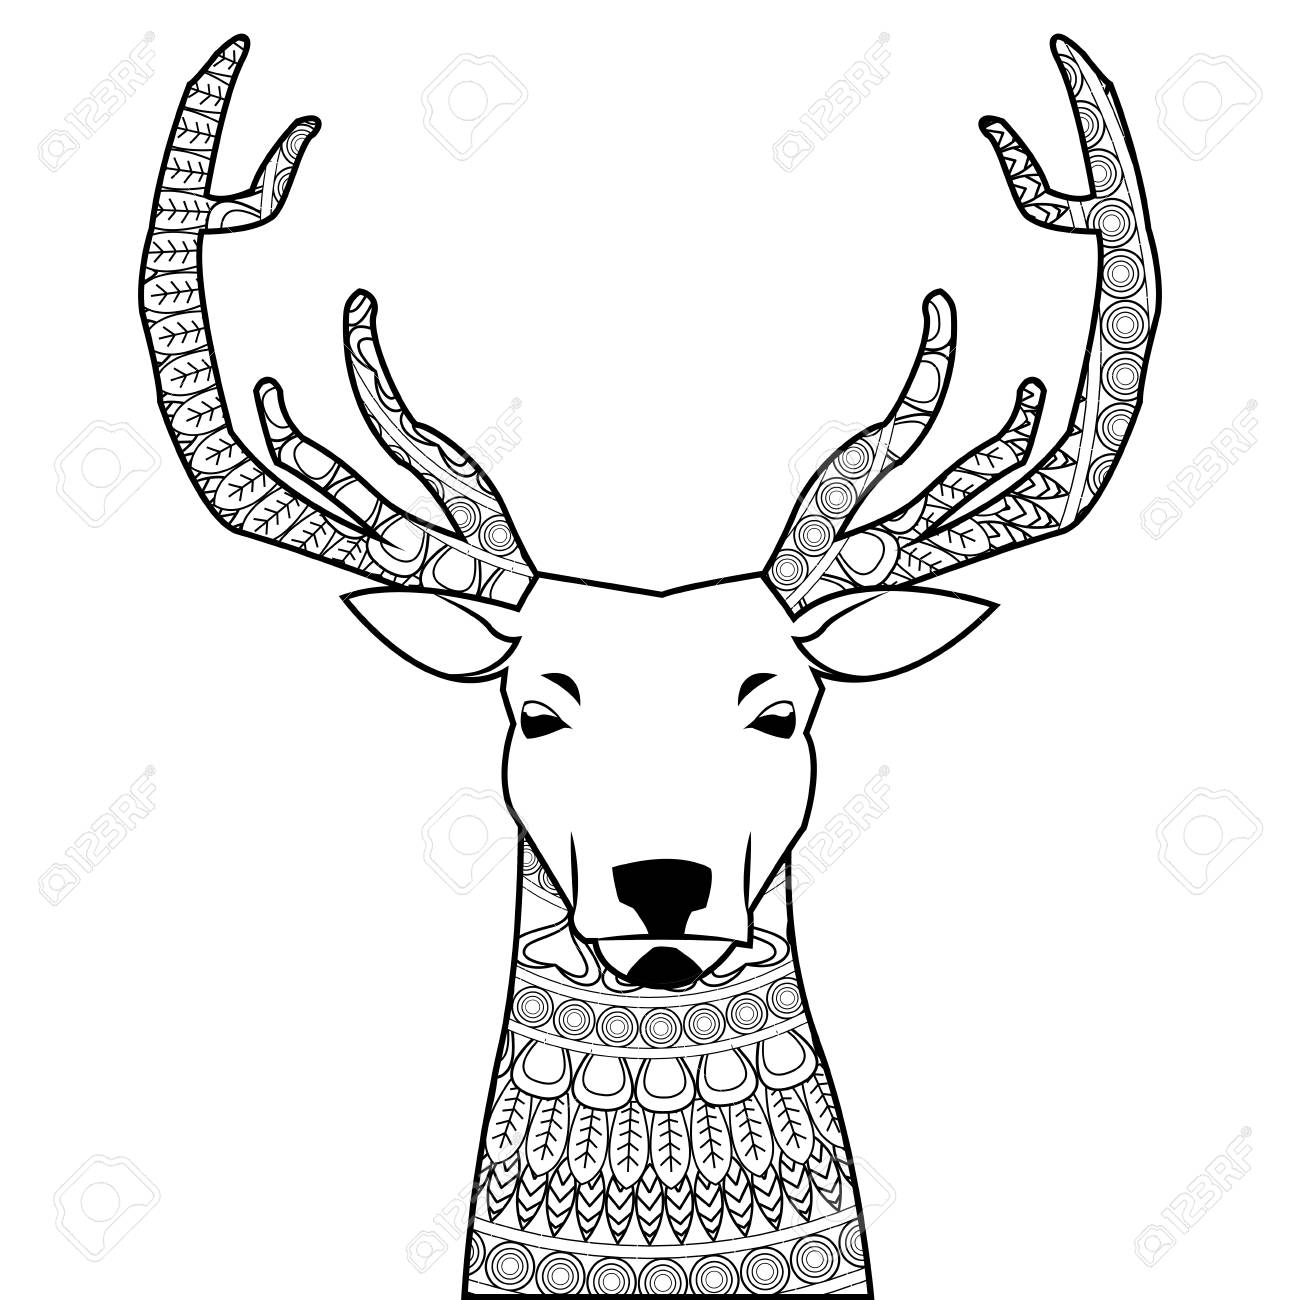 Coloriage Animaux Simple.Design Plat Simple Cerf Mandala Icone Illustration Vectorielle Coloriage Animal